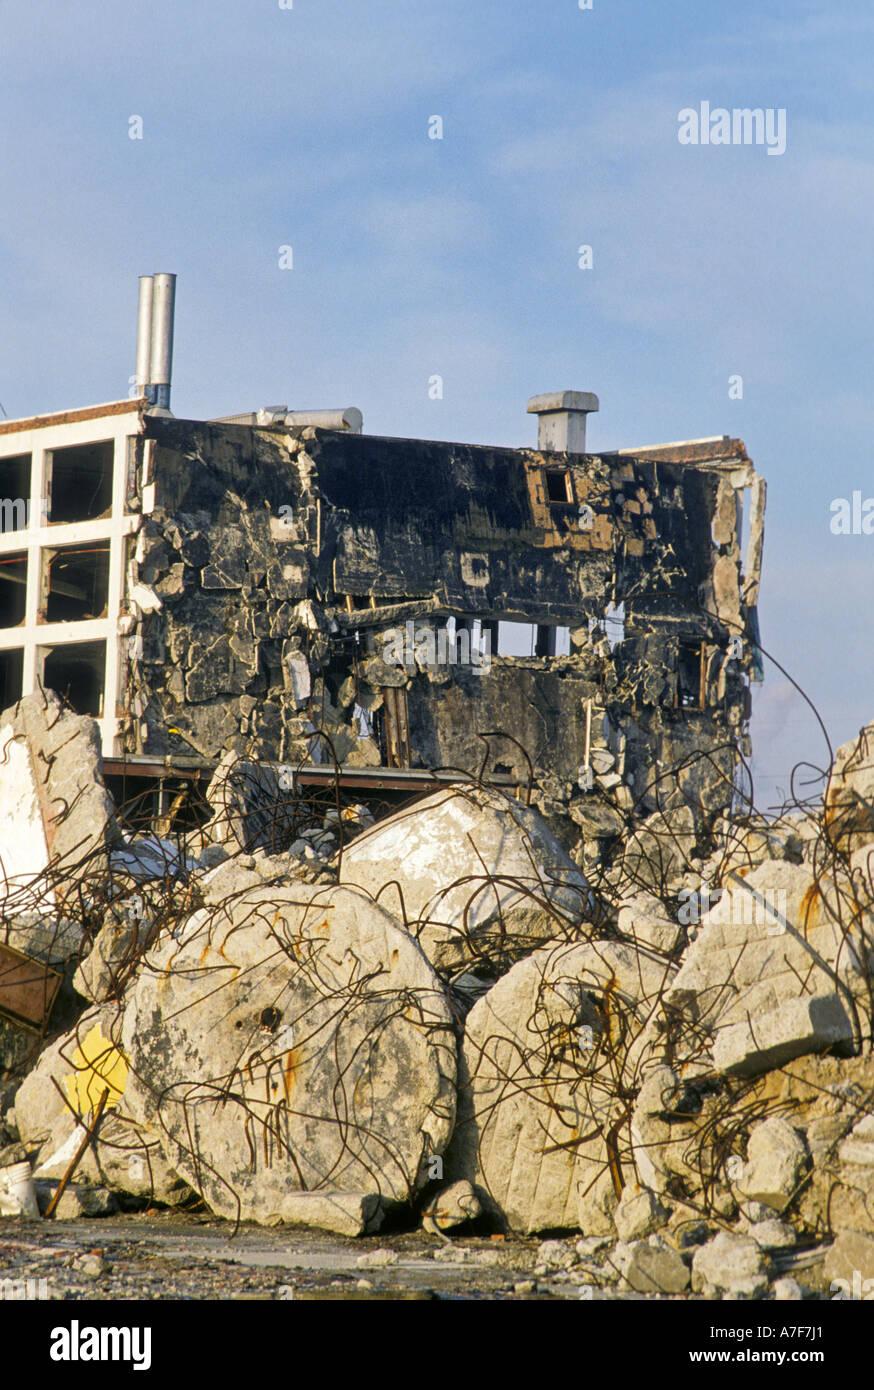 Detroit Michigan Demolition of General Motors Fleetwood plant - Stock Image